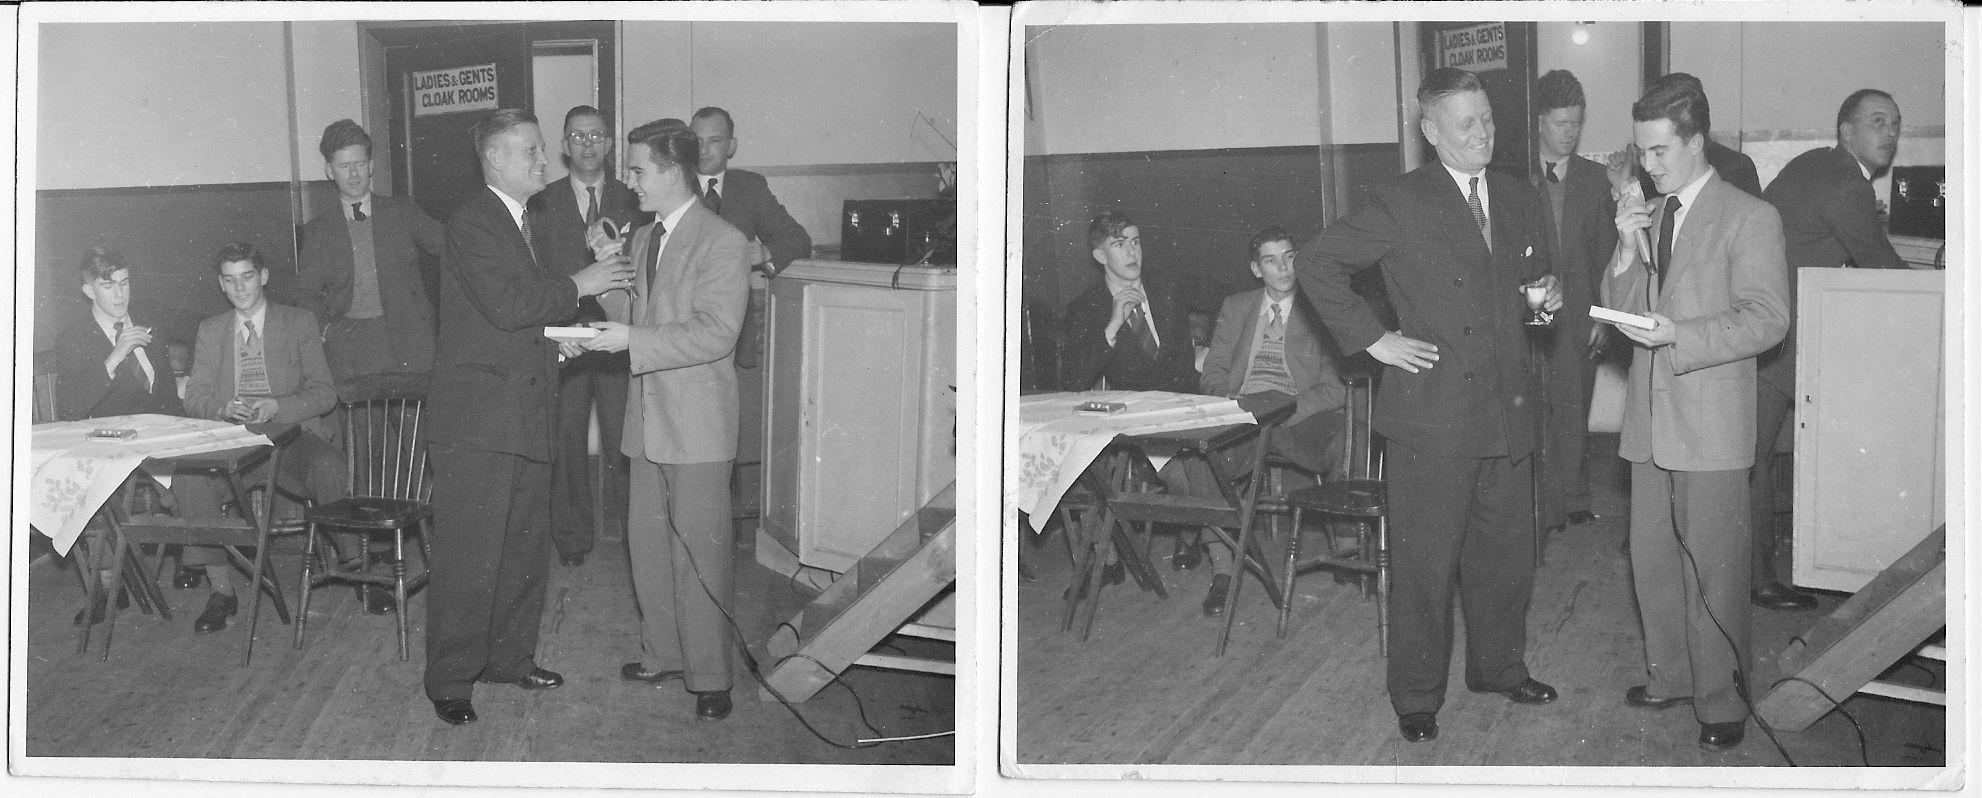 Fairey Surveys presentations 1959